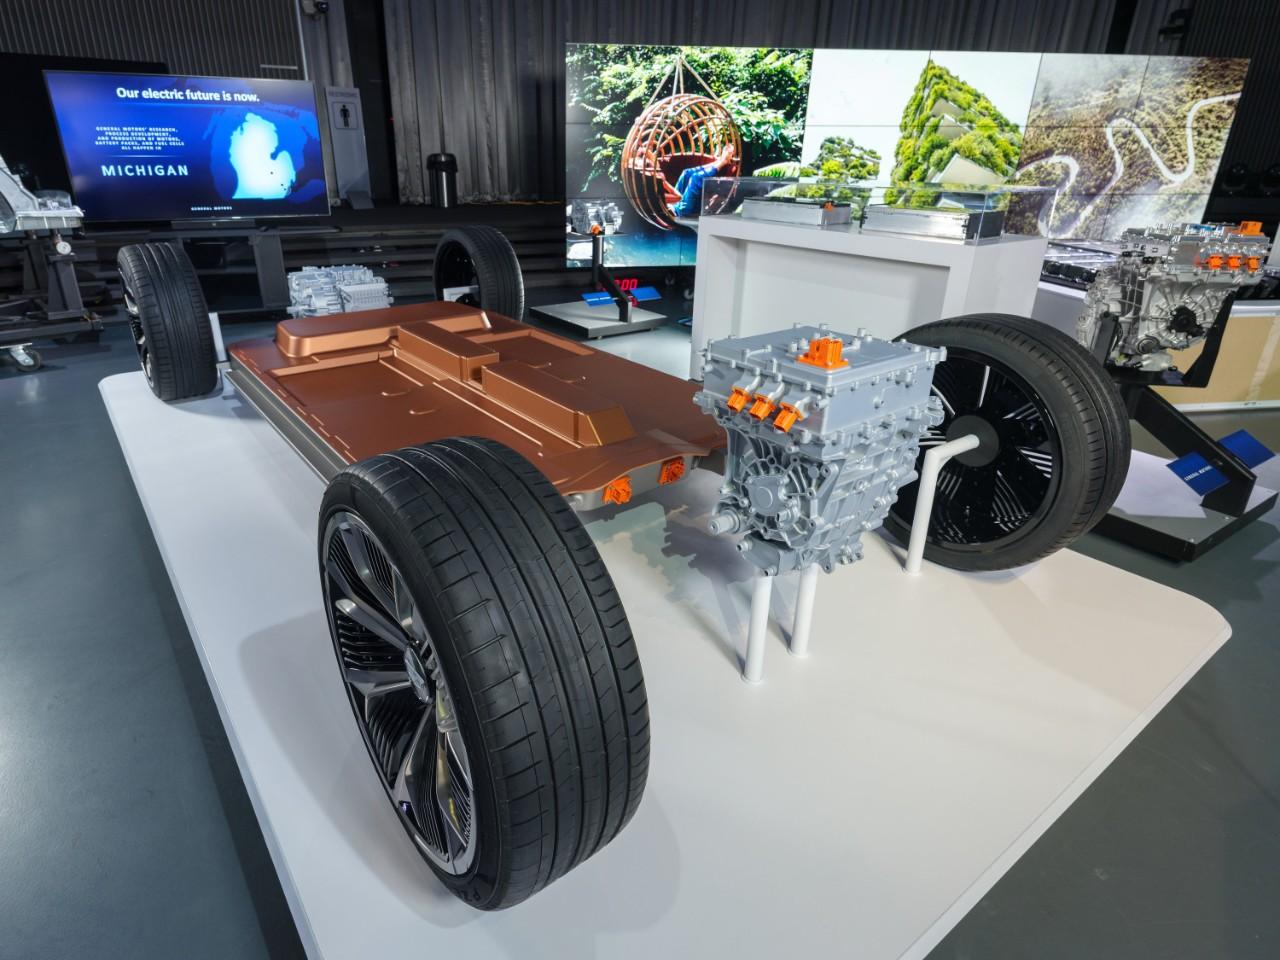 Report: GM adds electric van to its upcoming EV fleet in a bid to rival Tesla 2